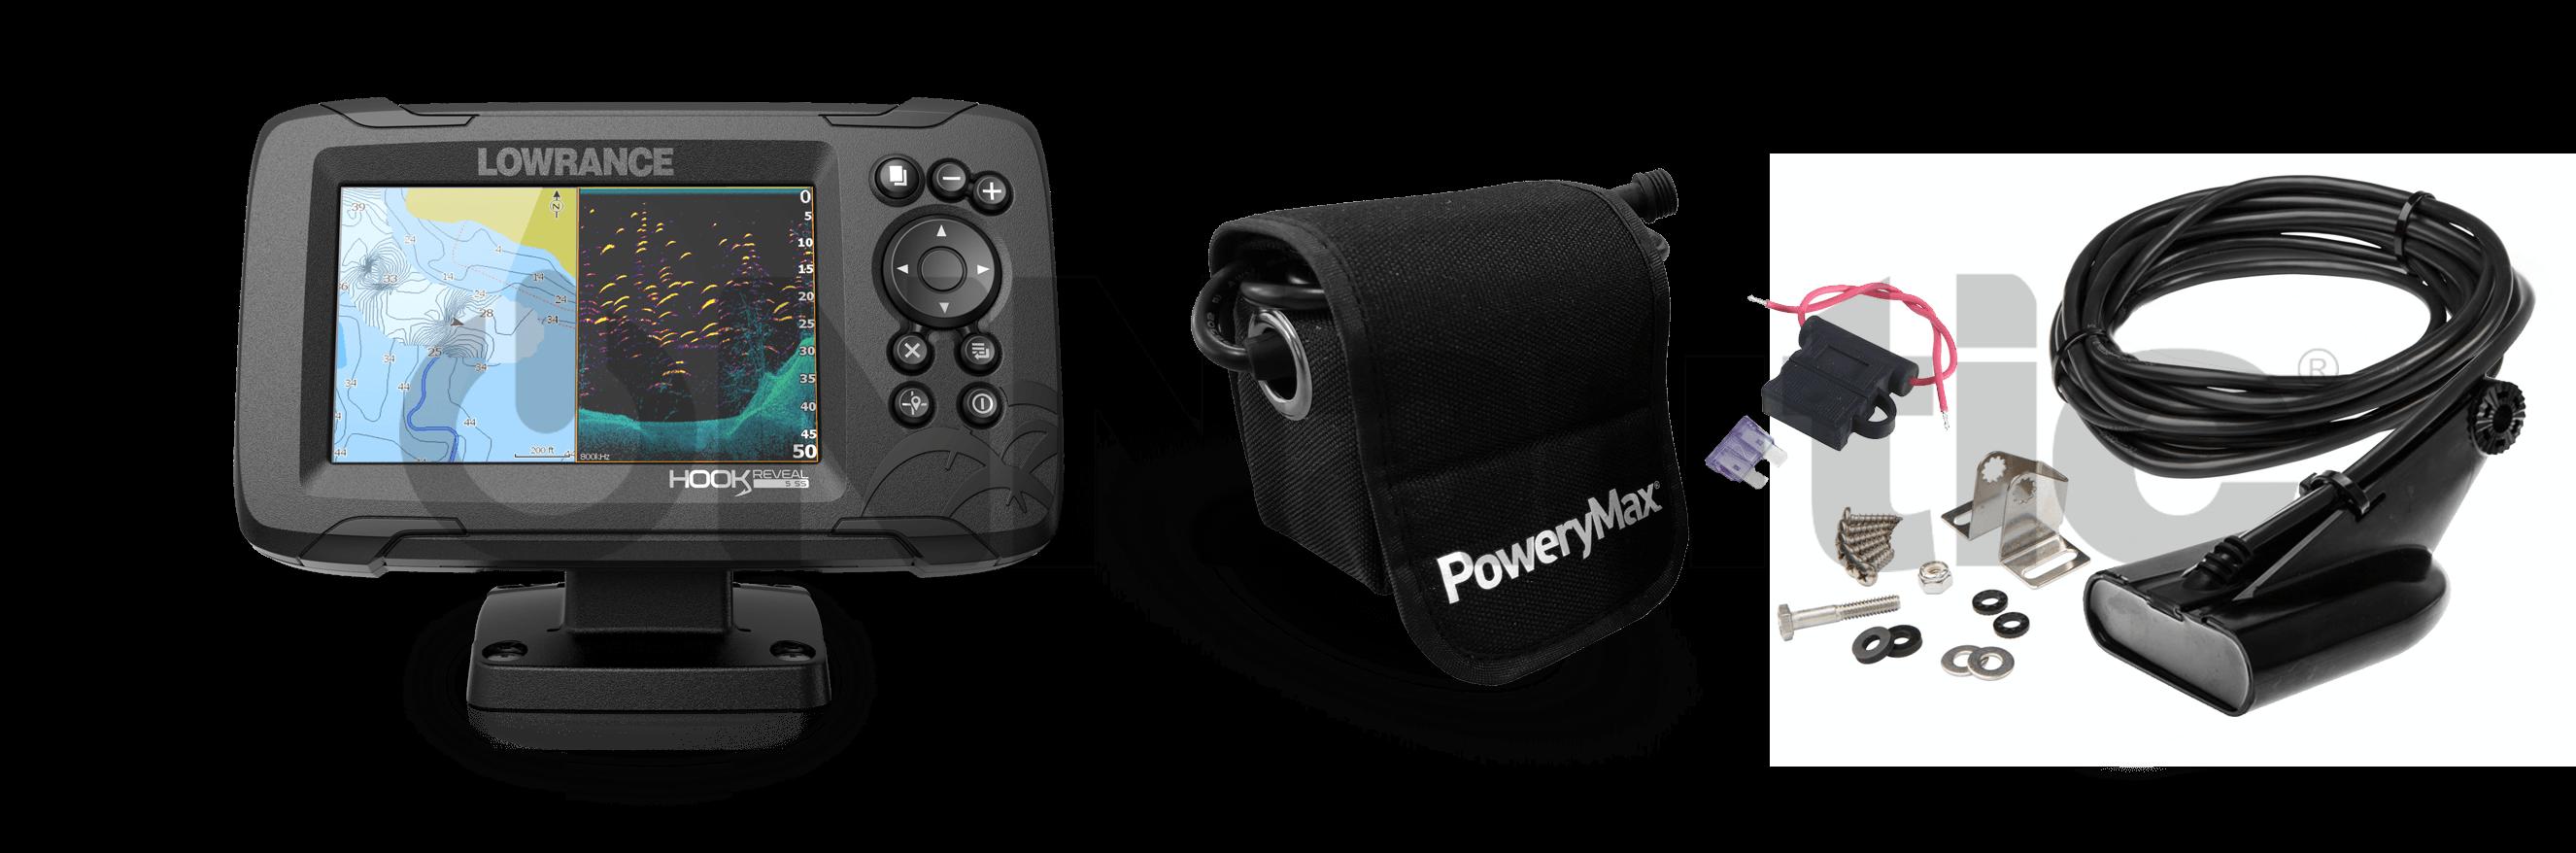 Hook Reveal PoweryMax Ready 50/200